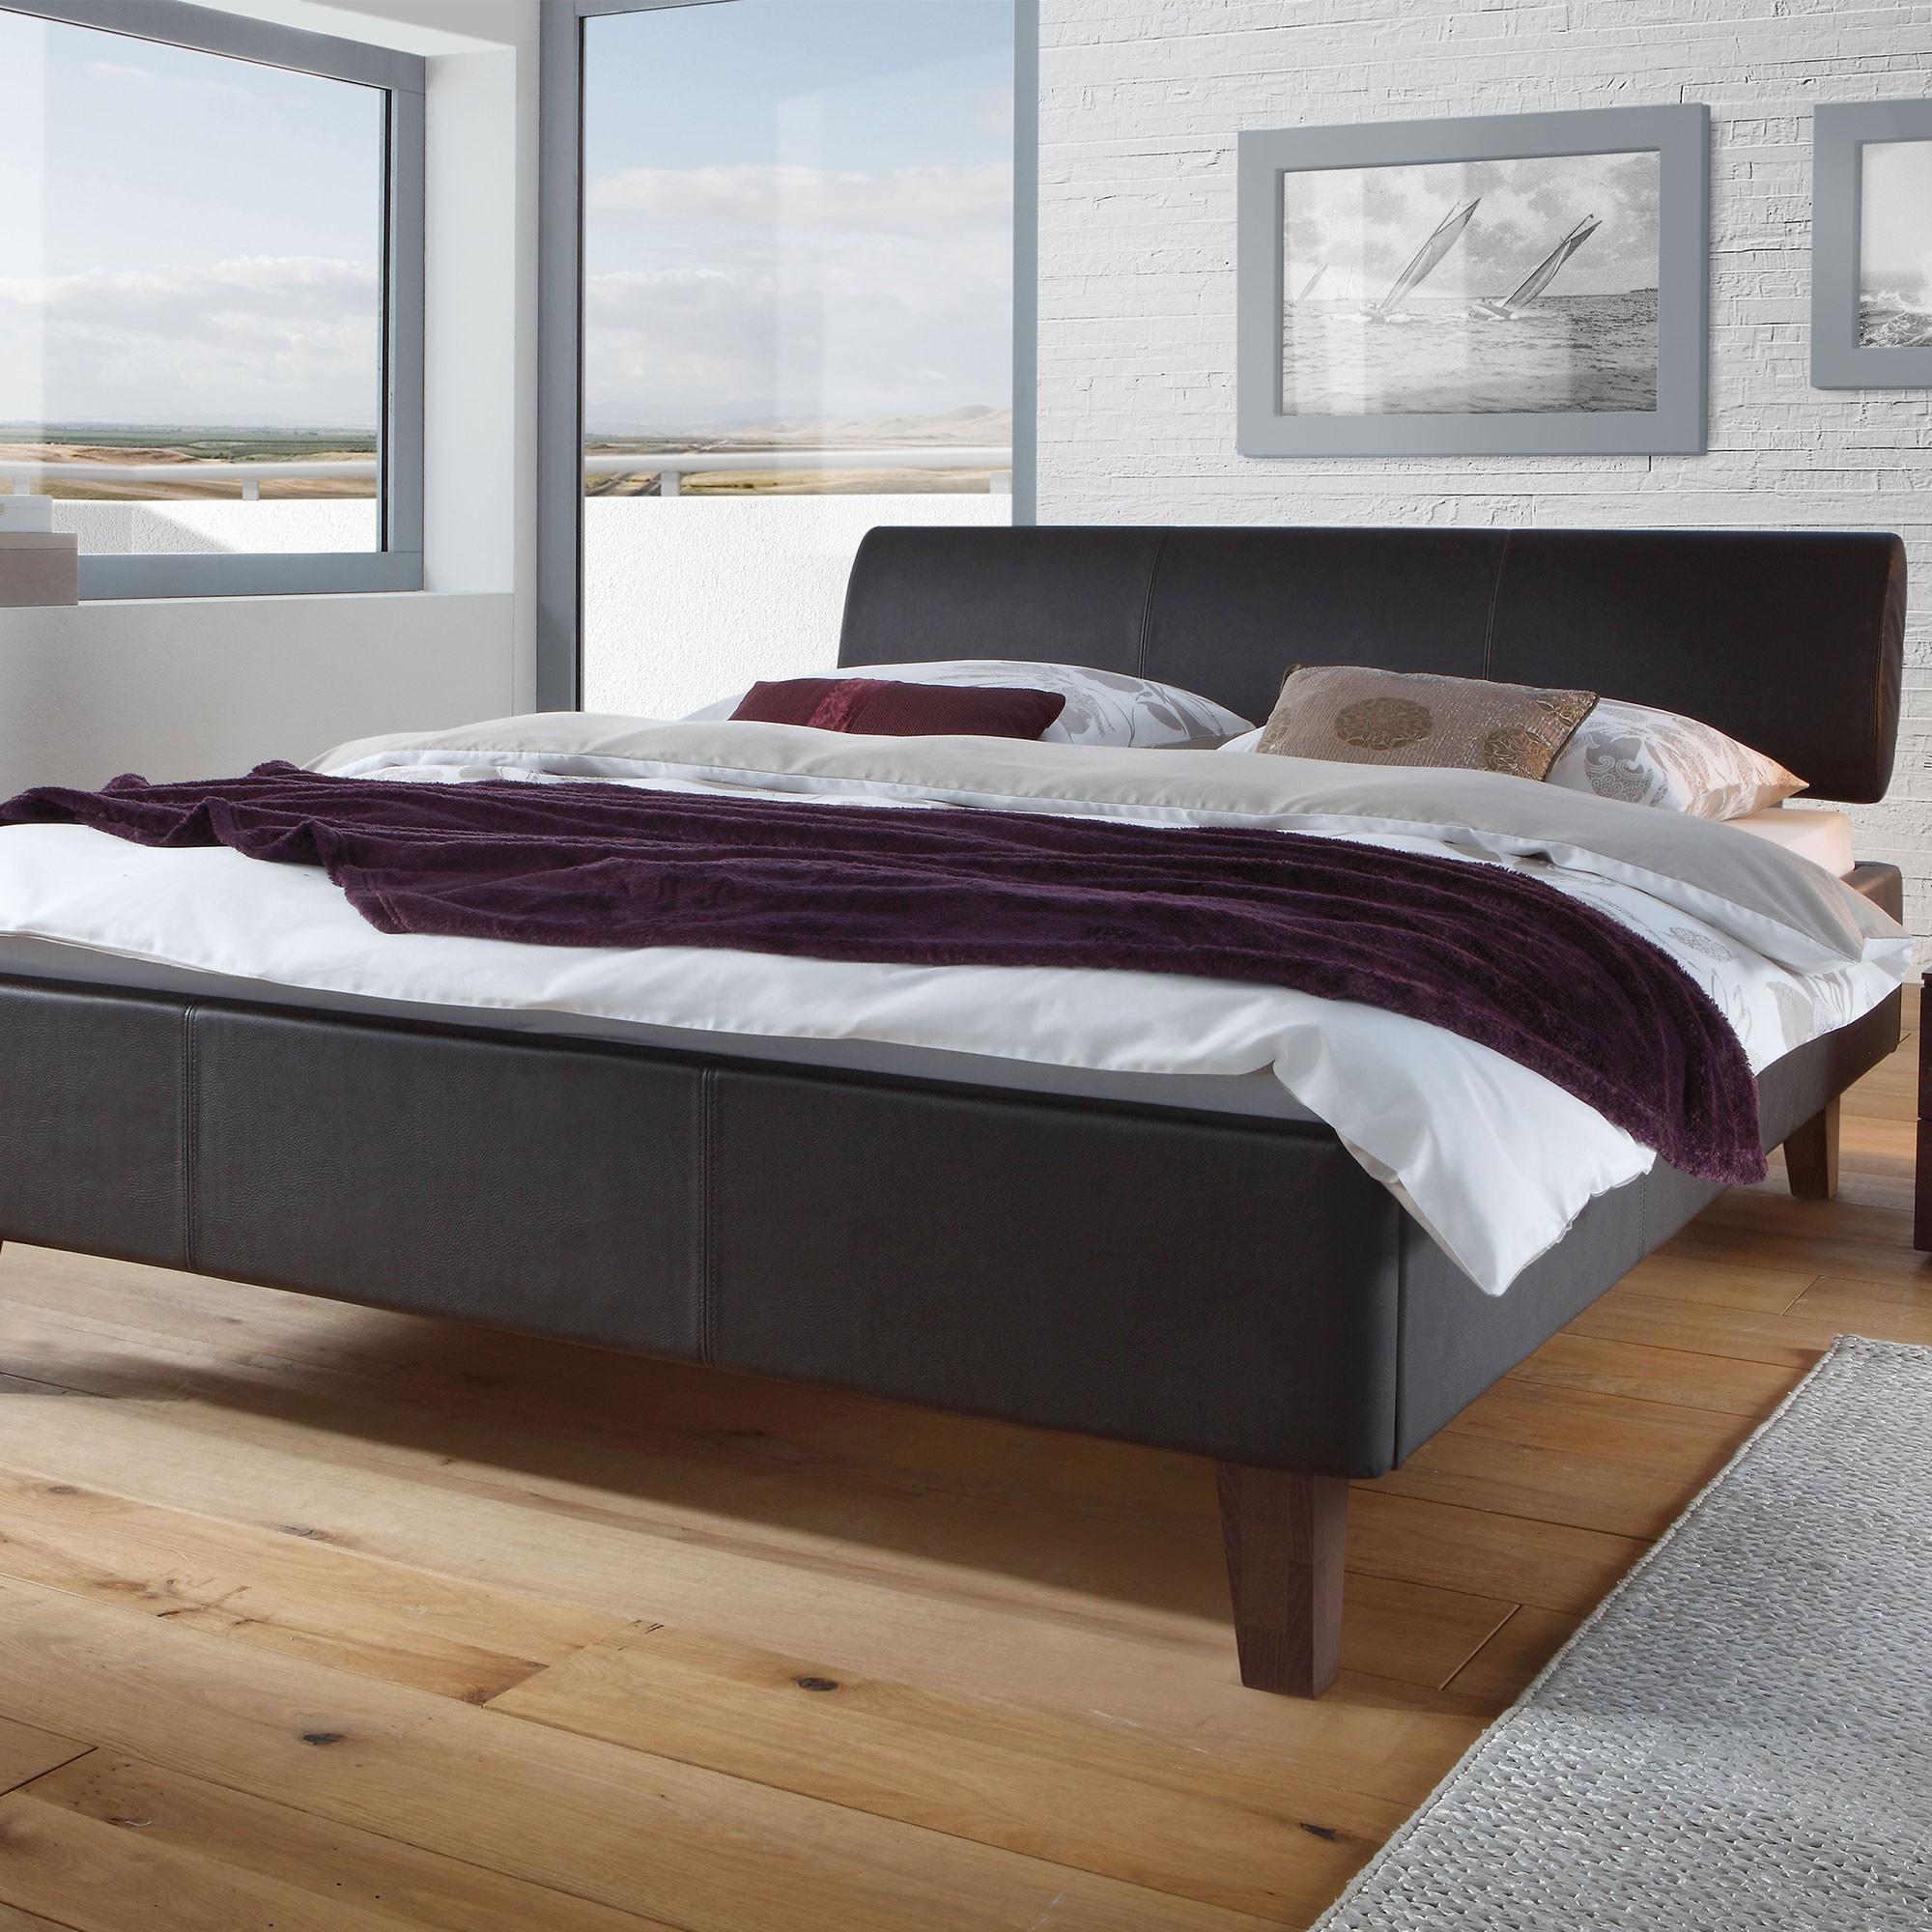 Full Size of Polsterbett 200x220 Hasena Dream Line Curvino Juve Elipsa Online Kaufen Bett Betten Wohnzimmer Polsterbett 200x220